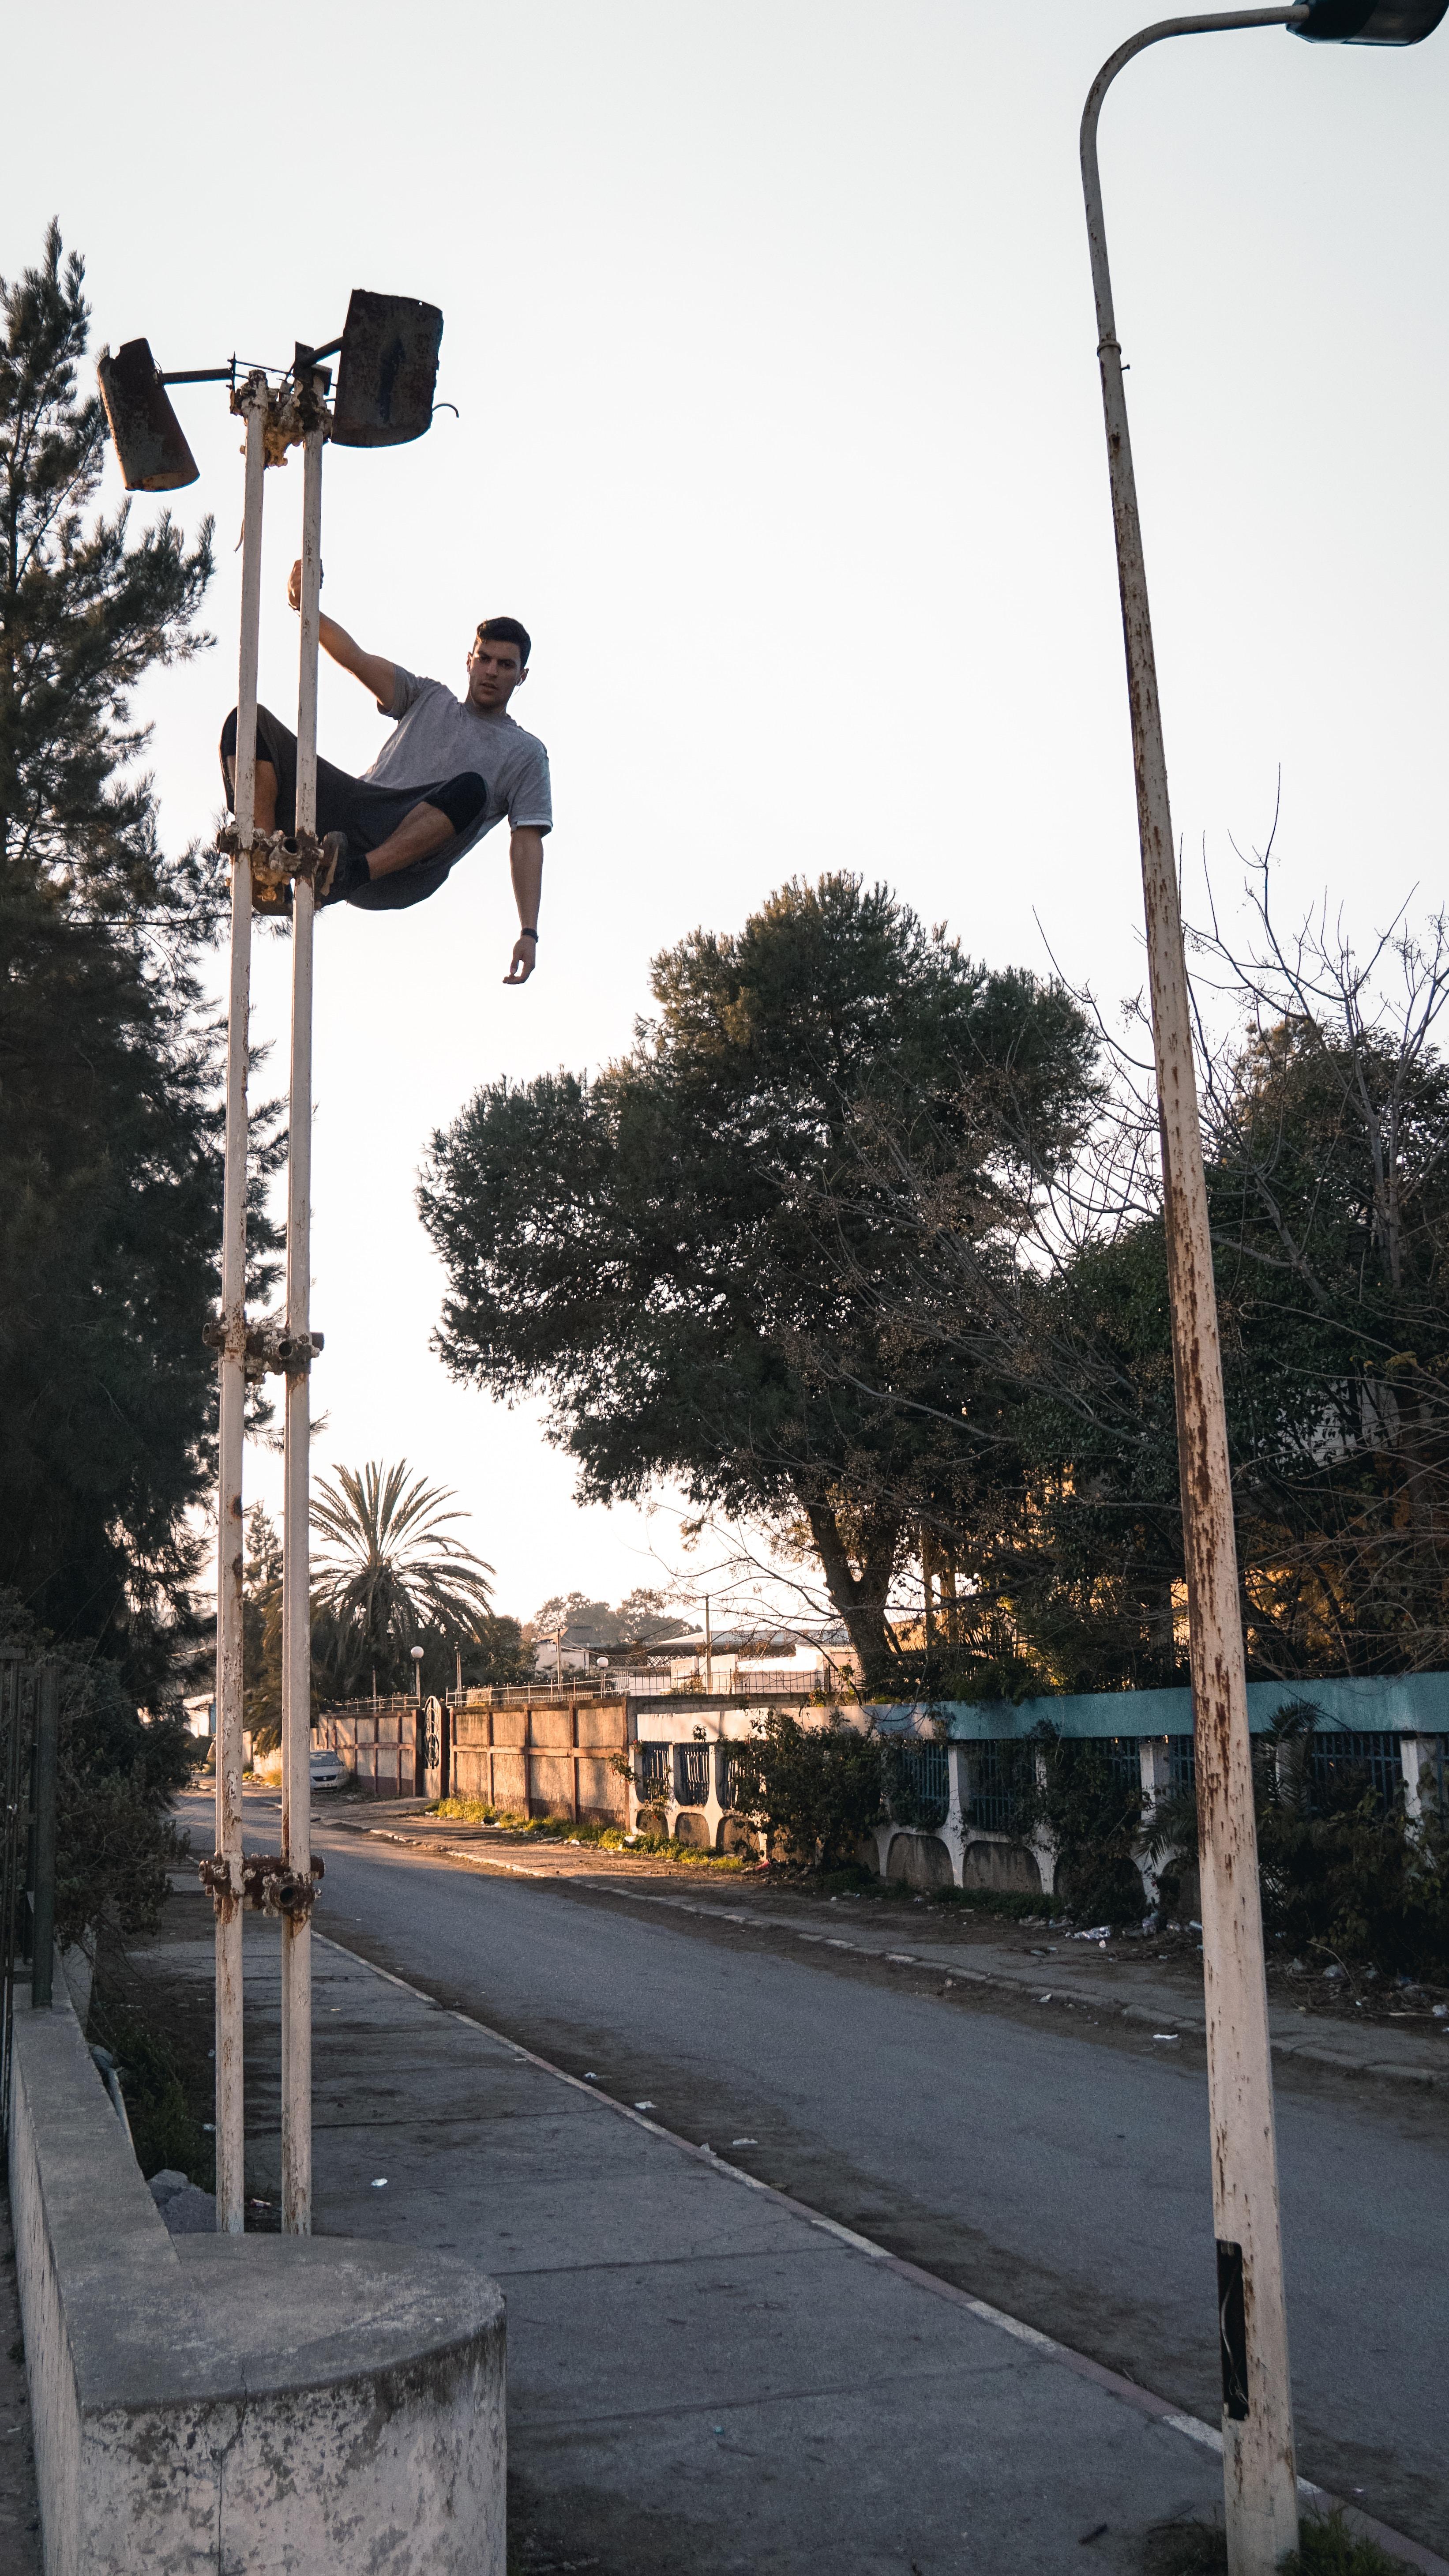 man climbing on outdoor light during daytime